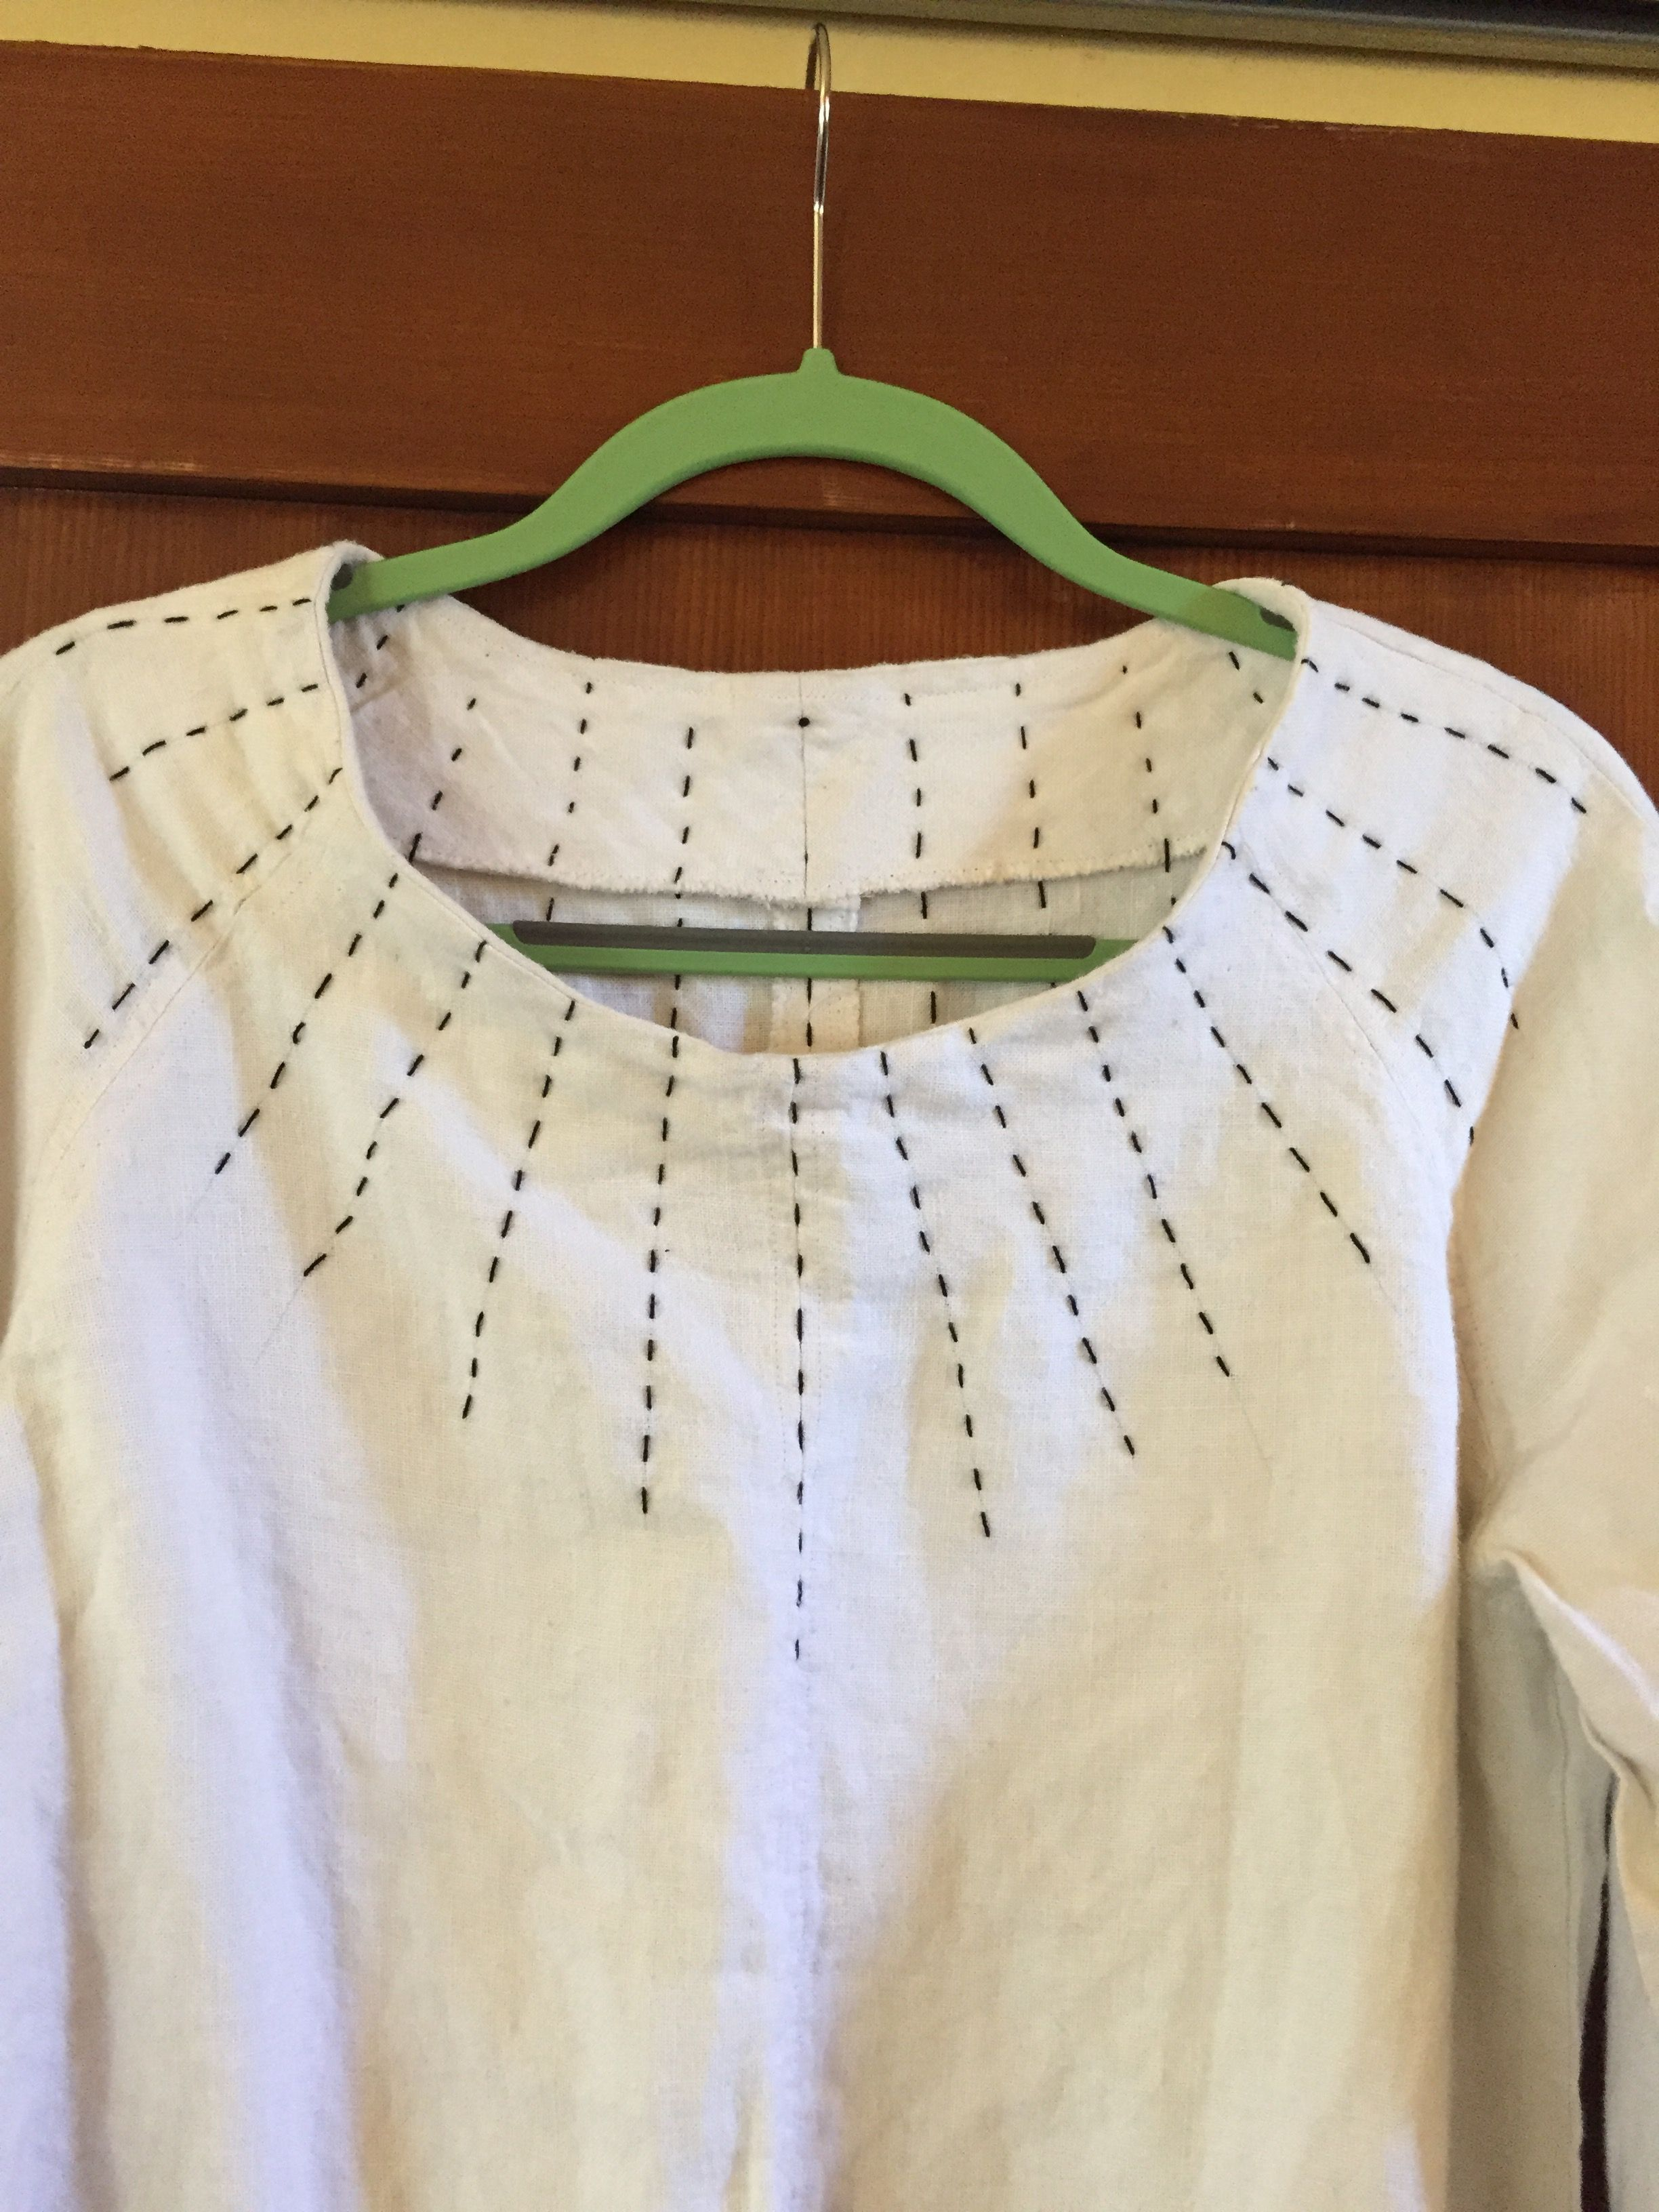 My first merchant u mills top in linen with sun ray sashiko